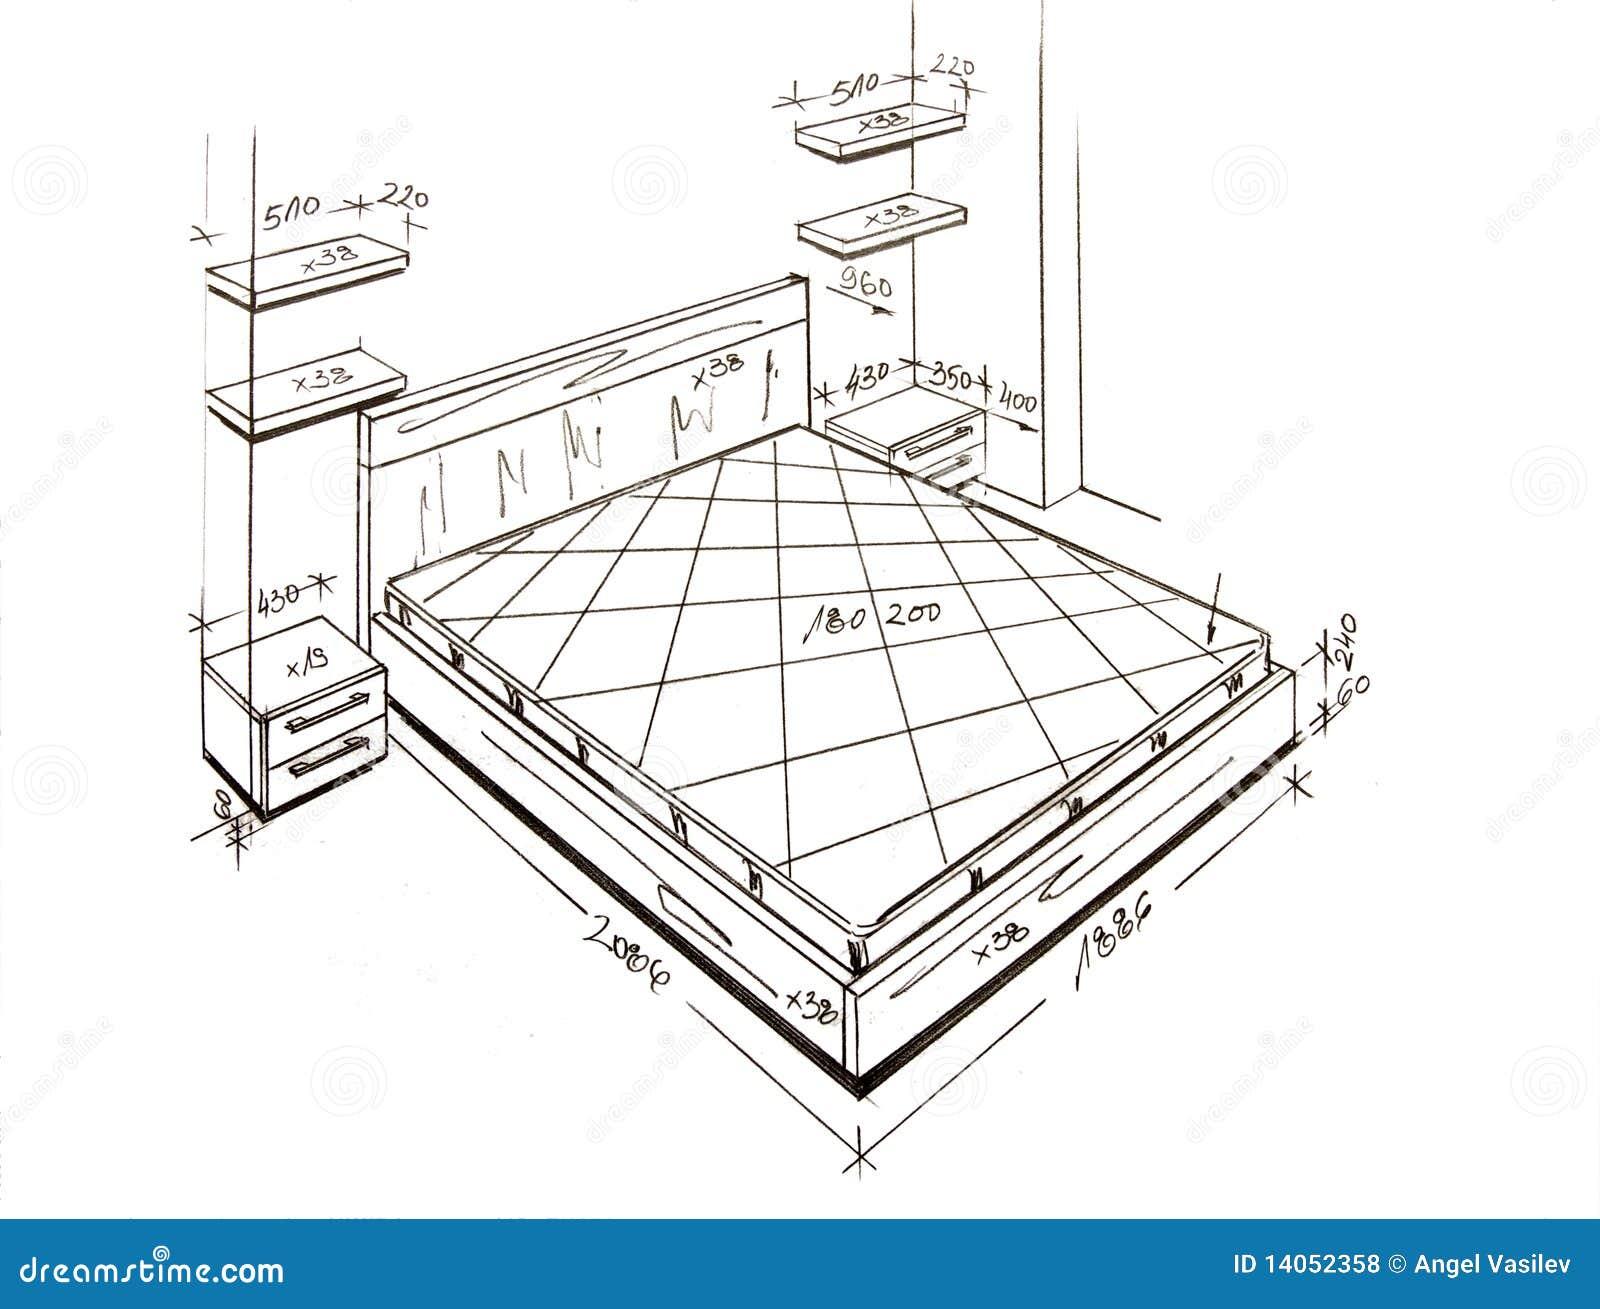 Modern interior design freehand drawing royalty free for Interior design drawings free download